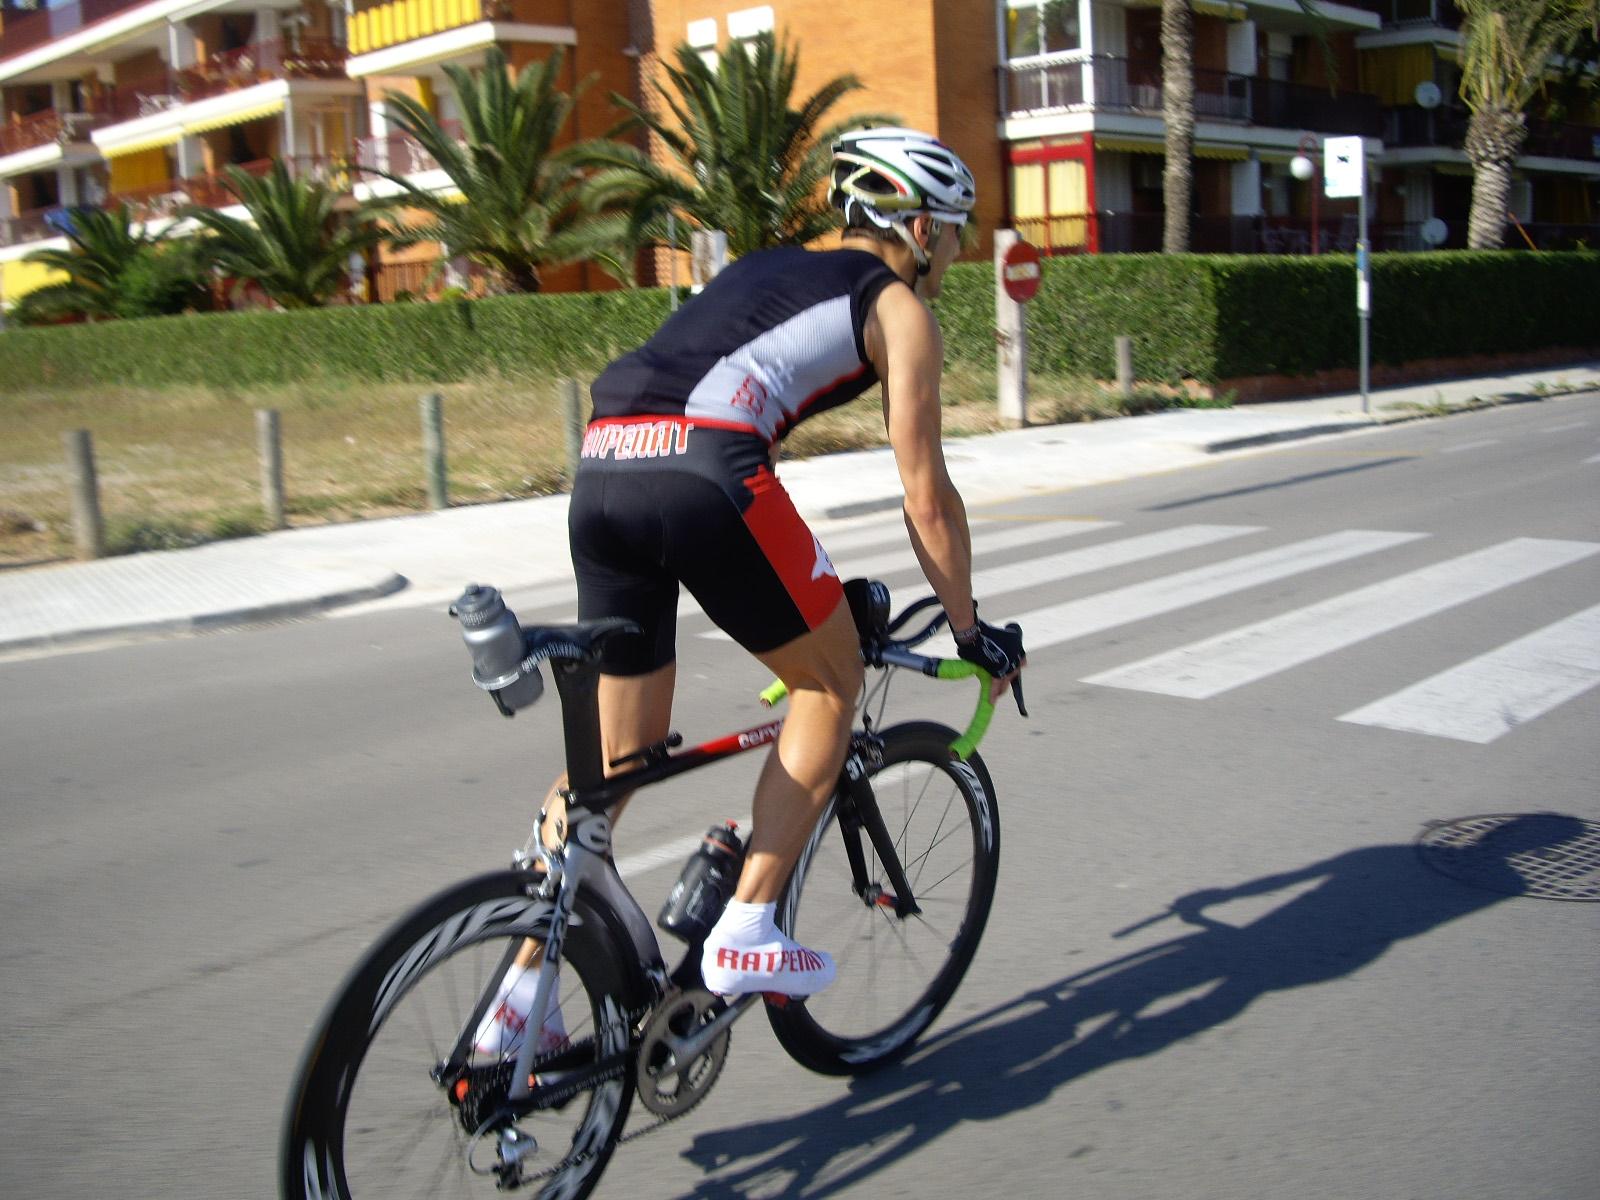 Circuito Wellness : Circuito wellness pineda hd p k foto